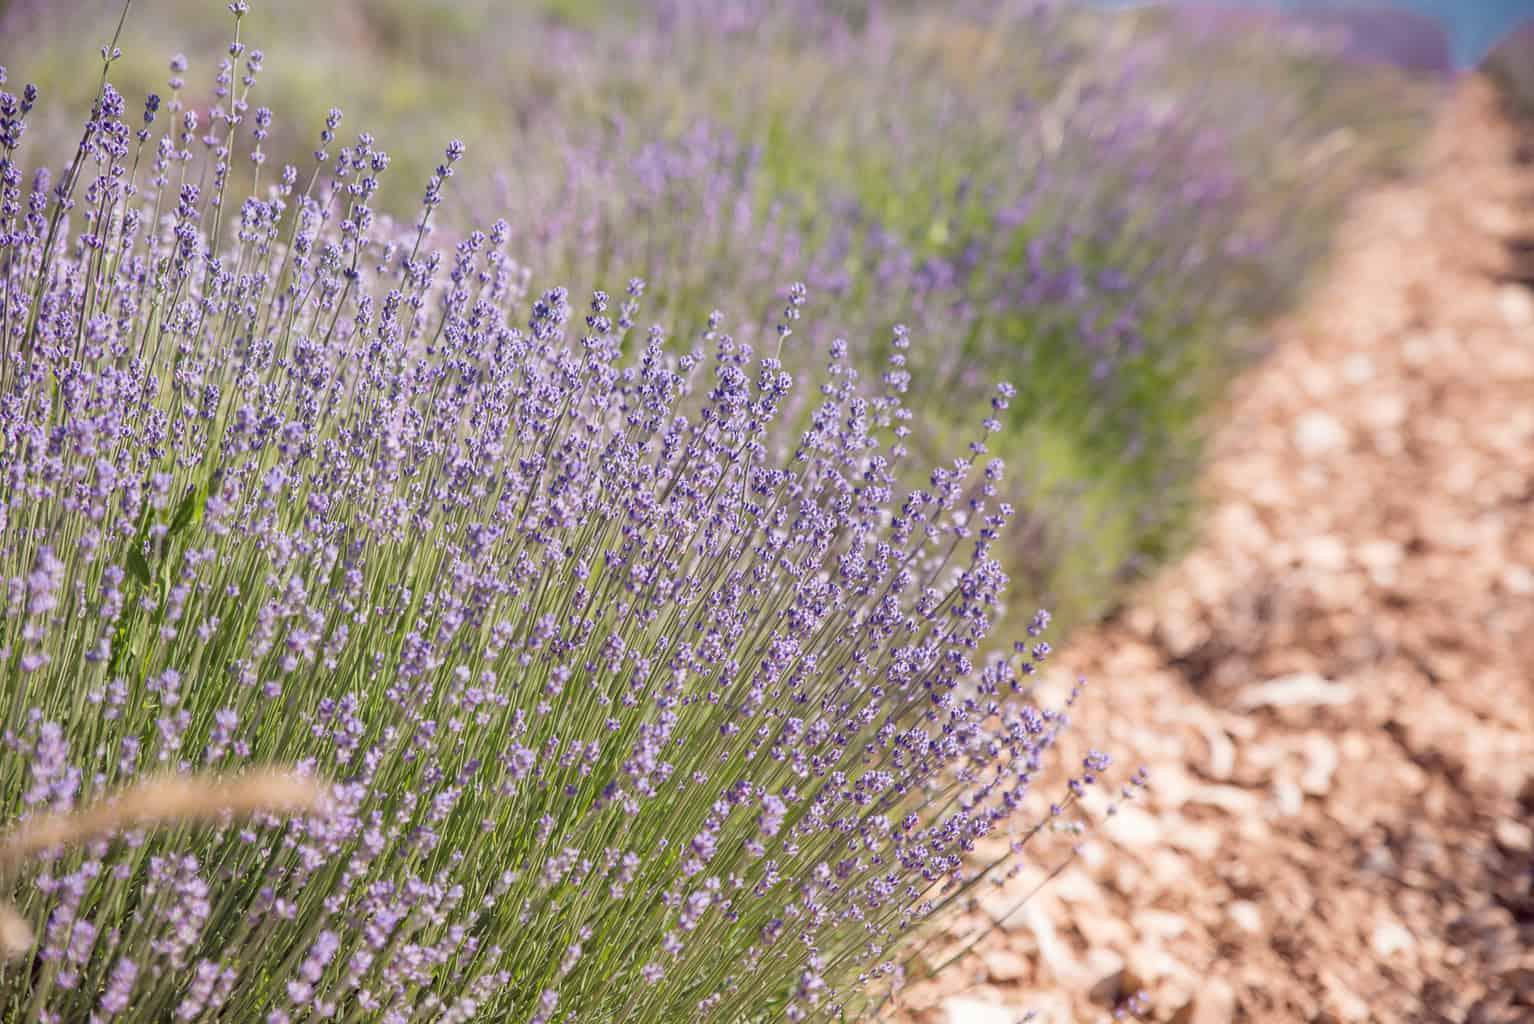 Fine lavender of Provence